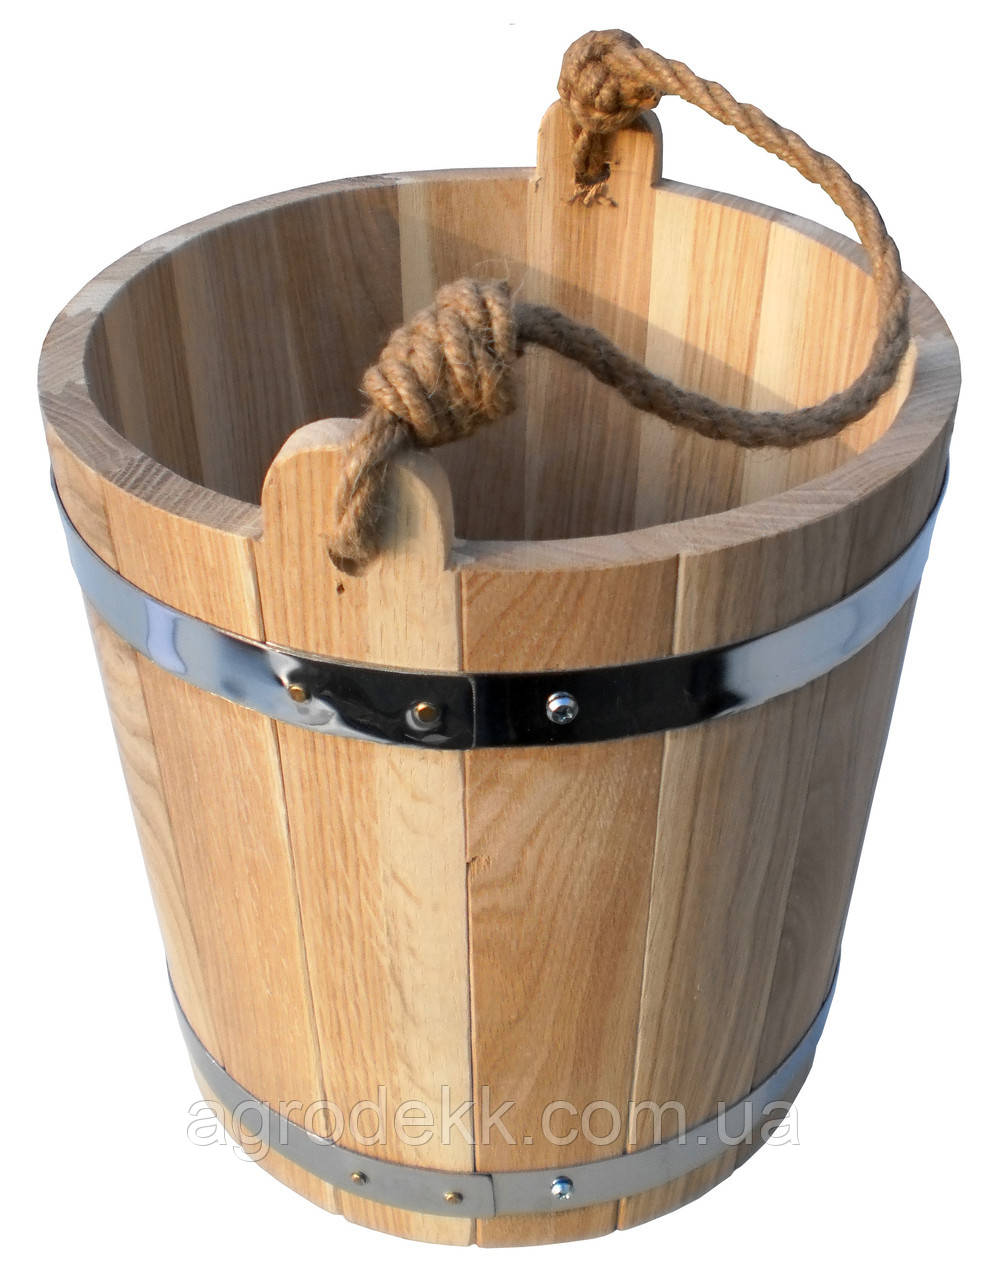 Ведро для бани 12 л. (эконом)